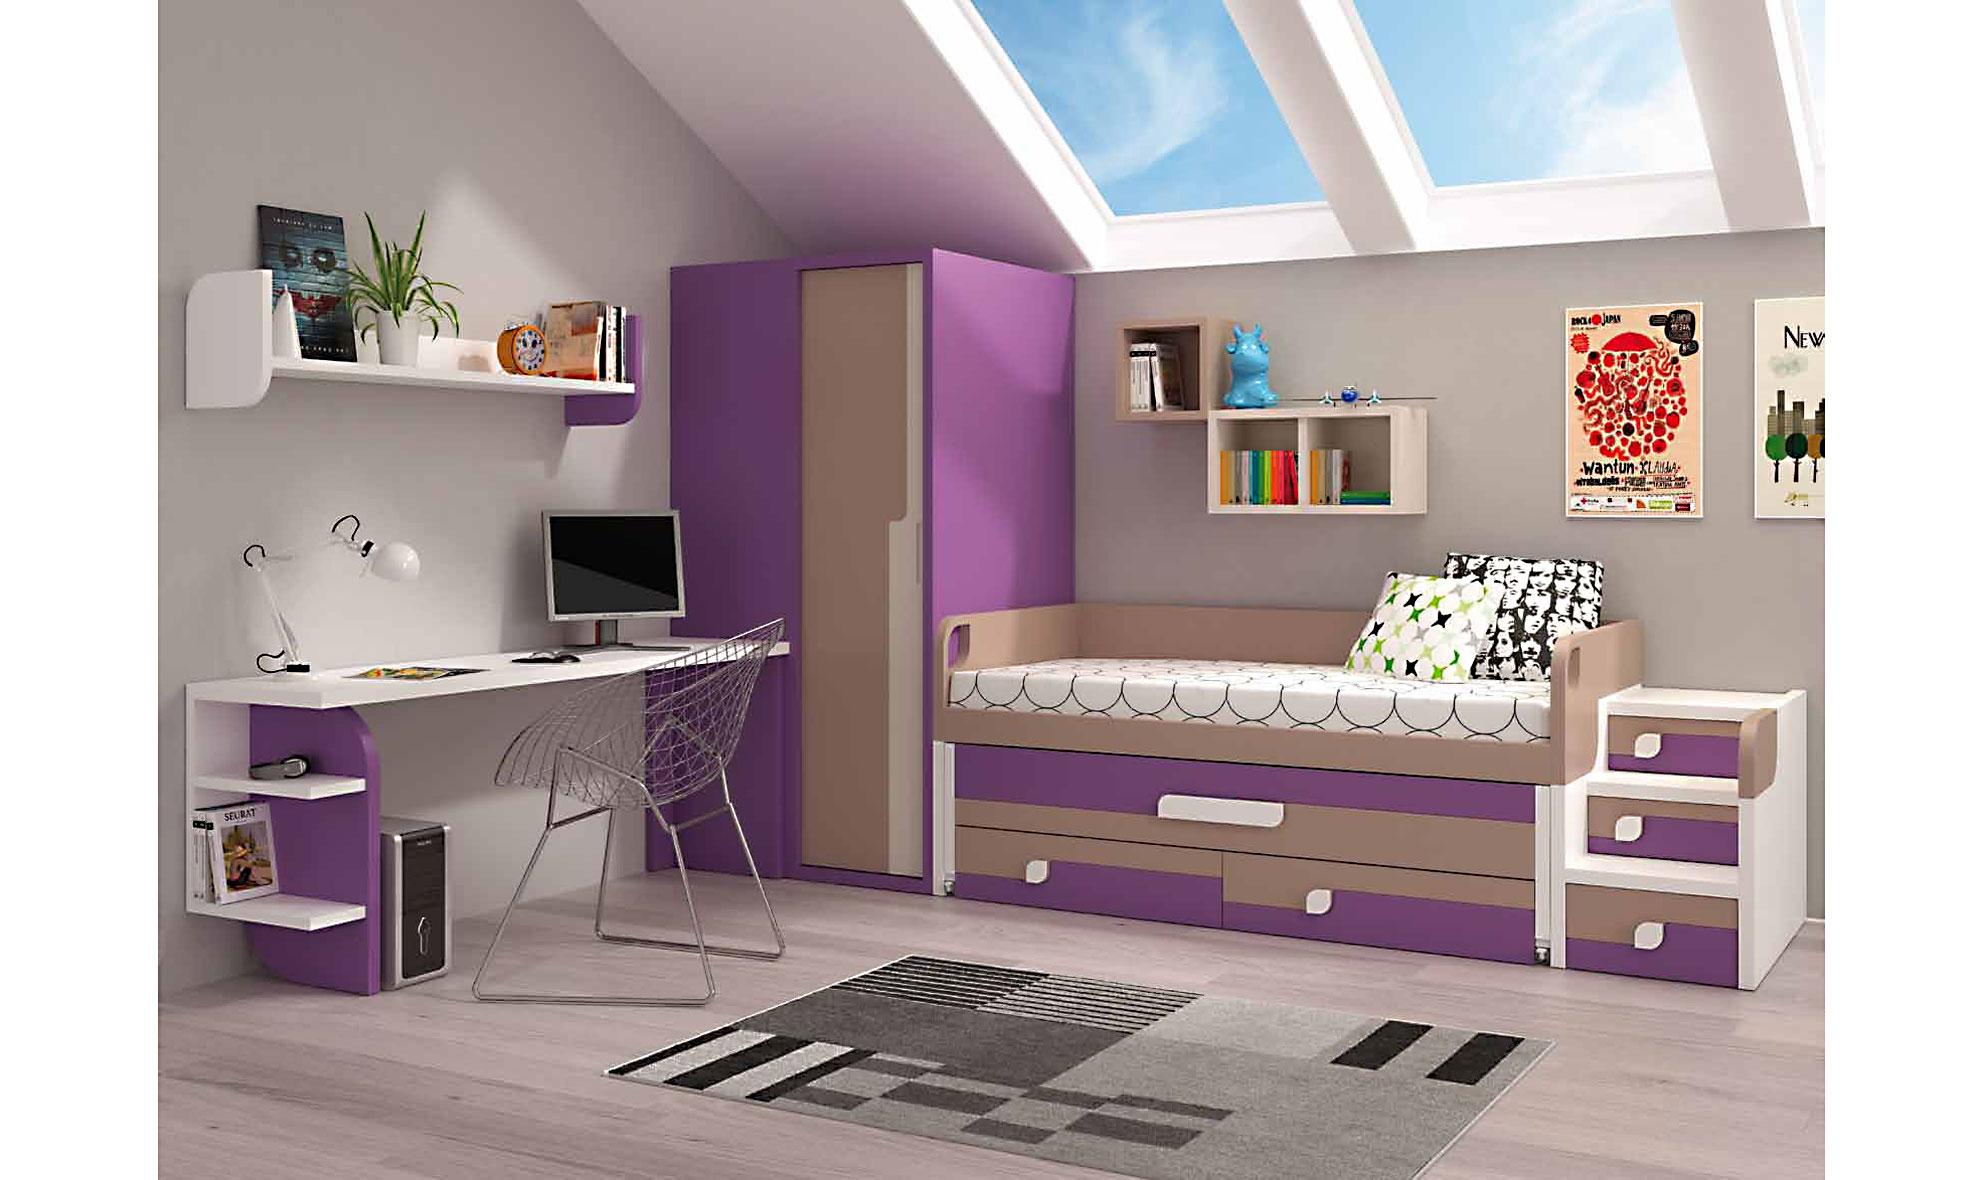 Dormitorio Juvenil Naomi En Portobellostreet Es ~ Alfombras Para Dormitorios Juveniles